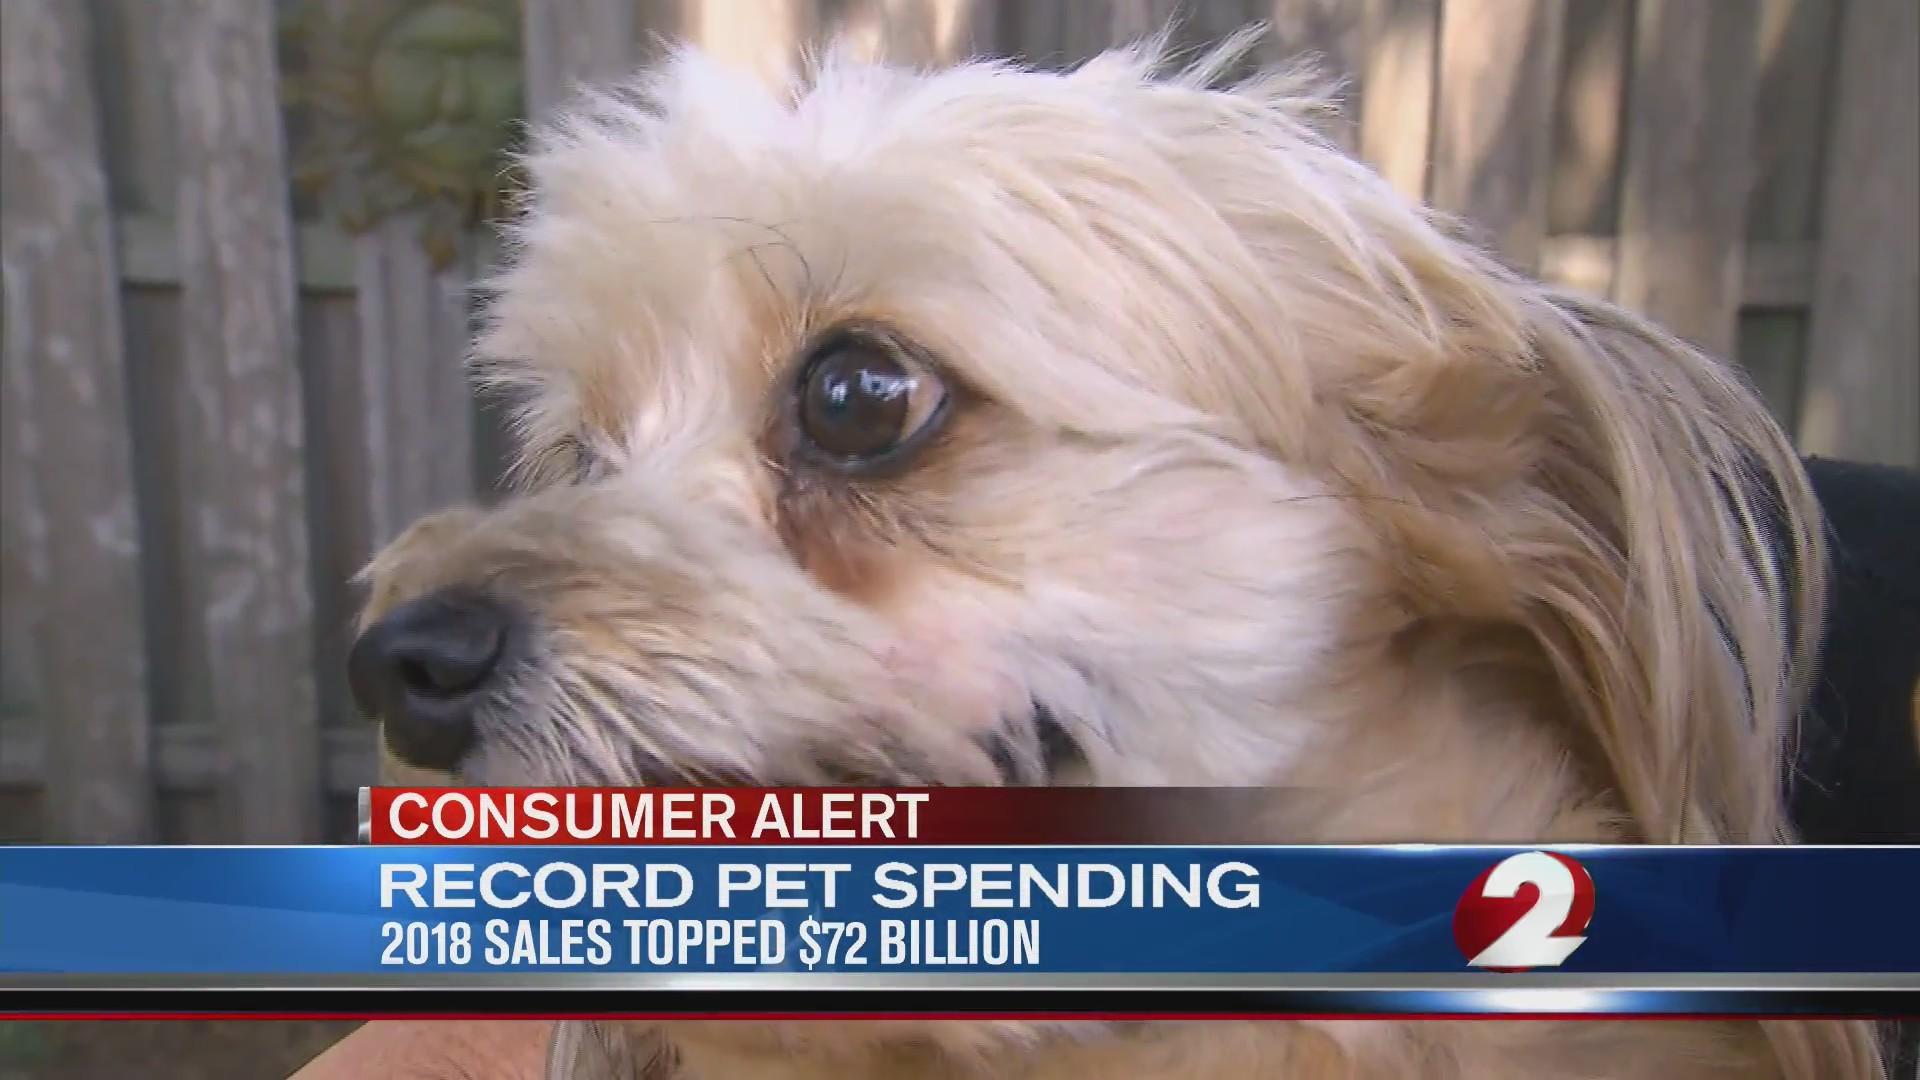 Record pet spending